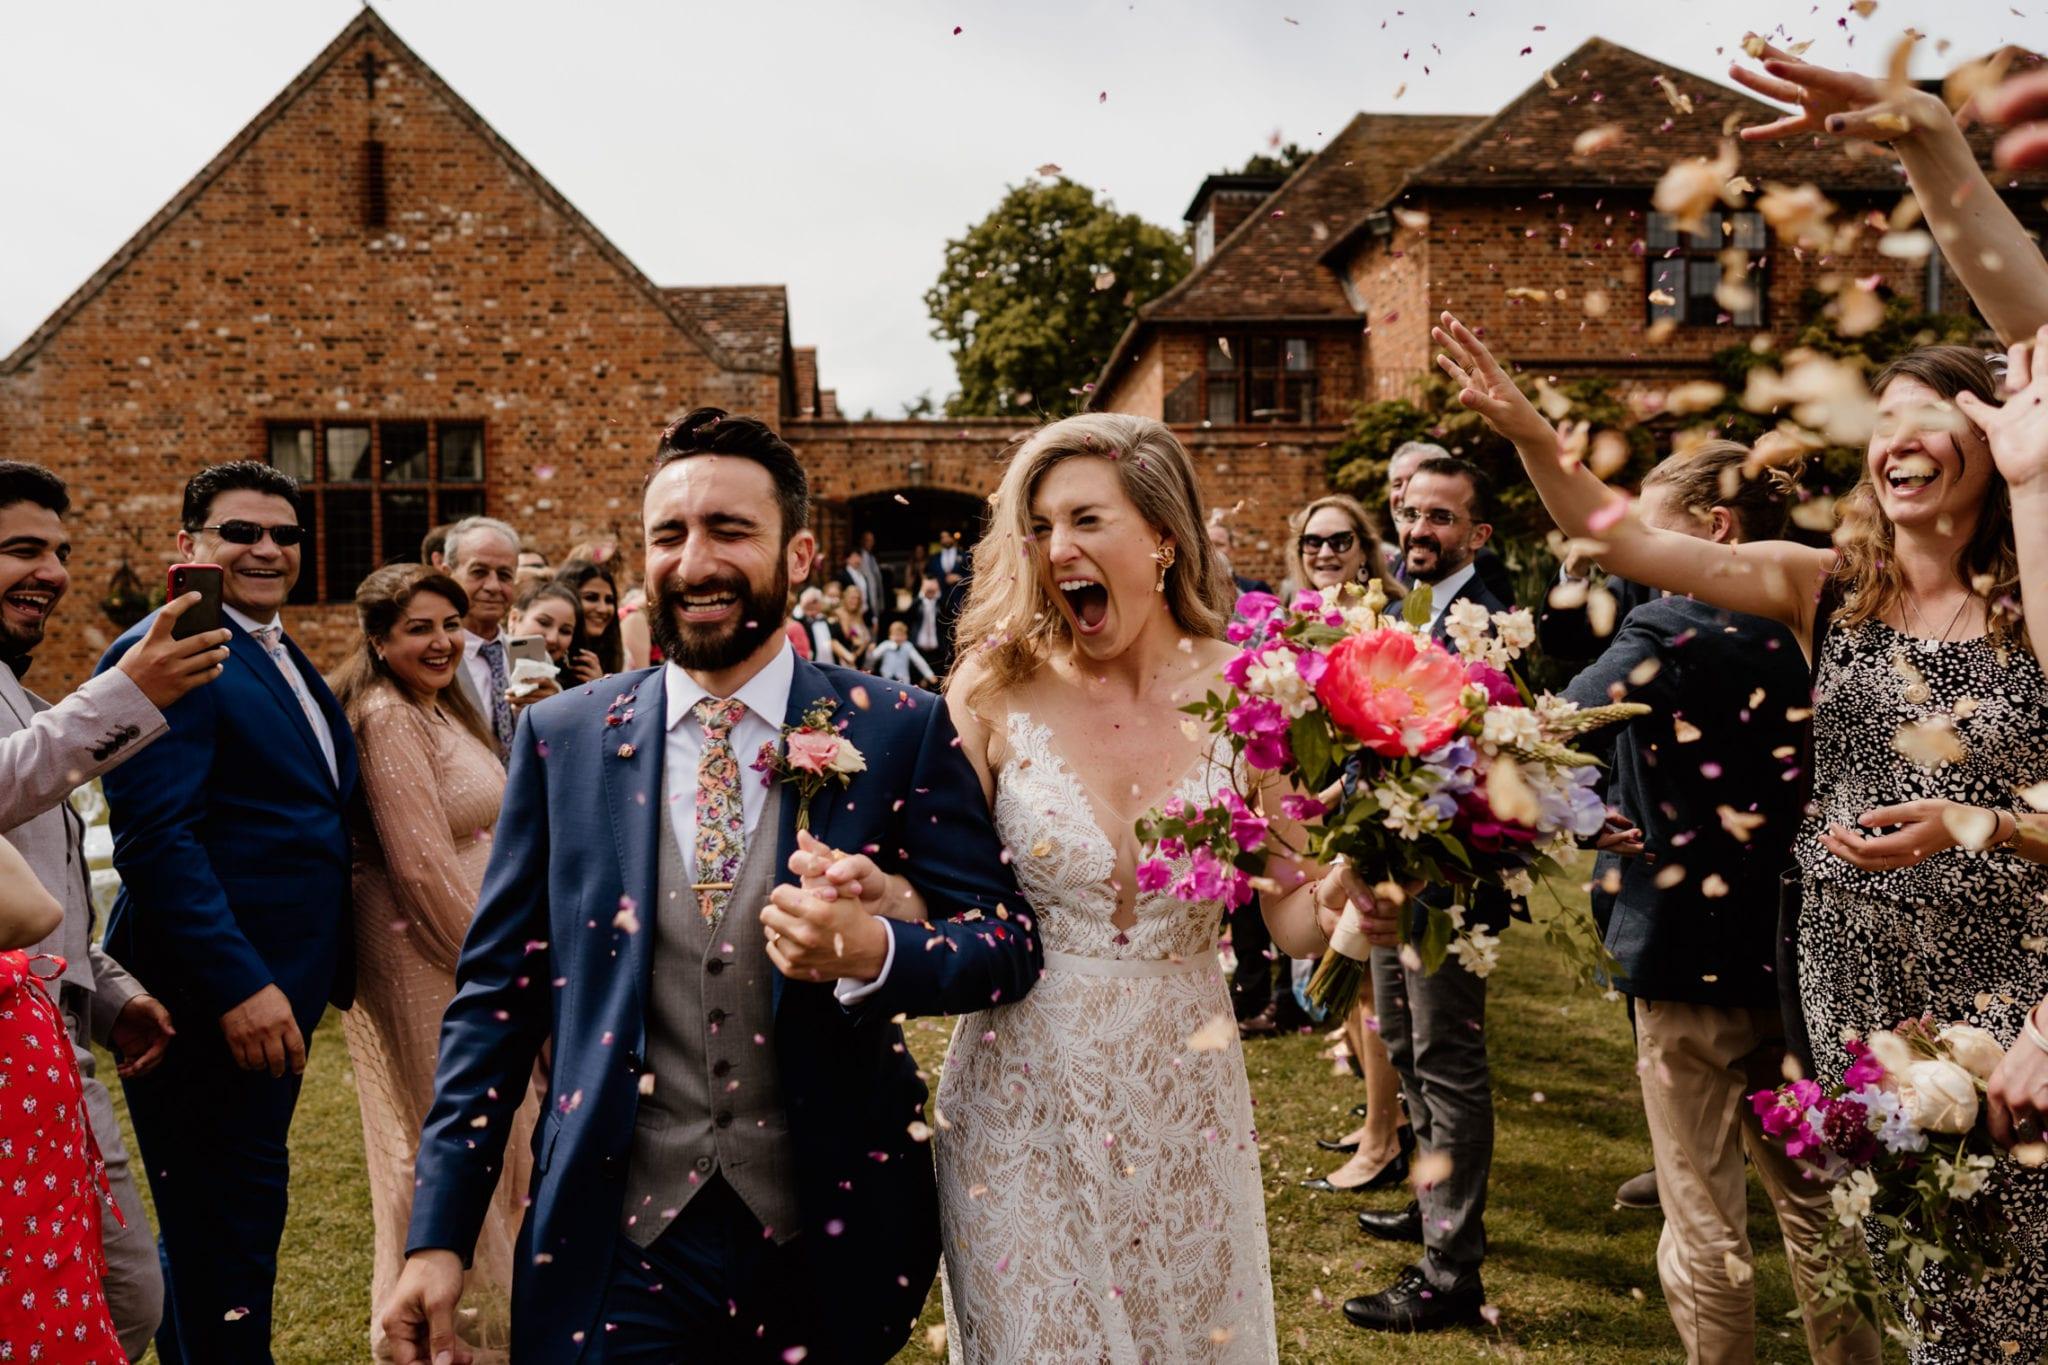 Confetti being thrown at wedding